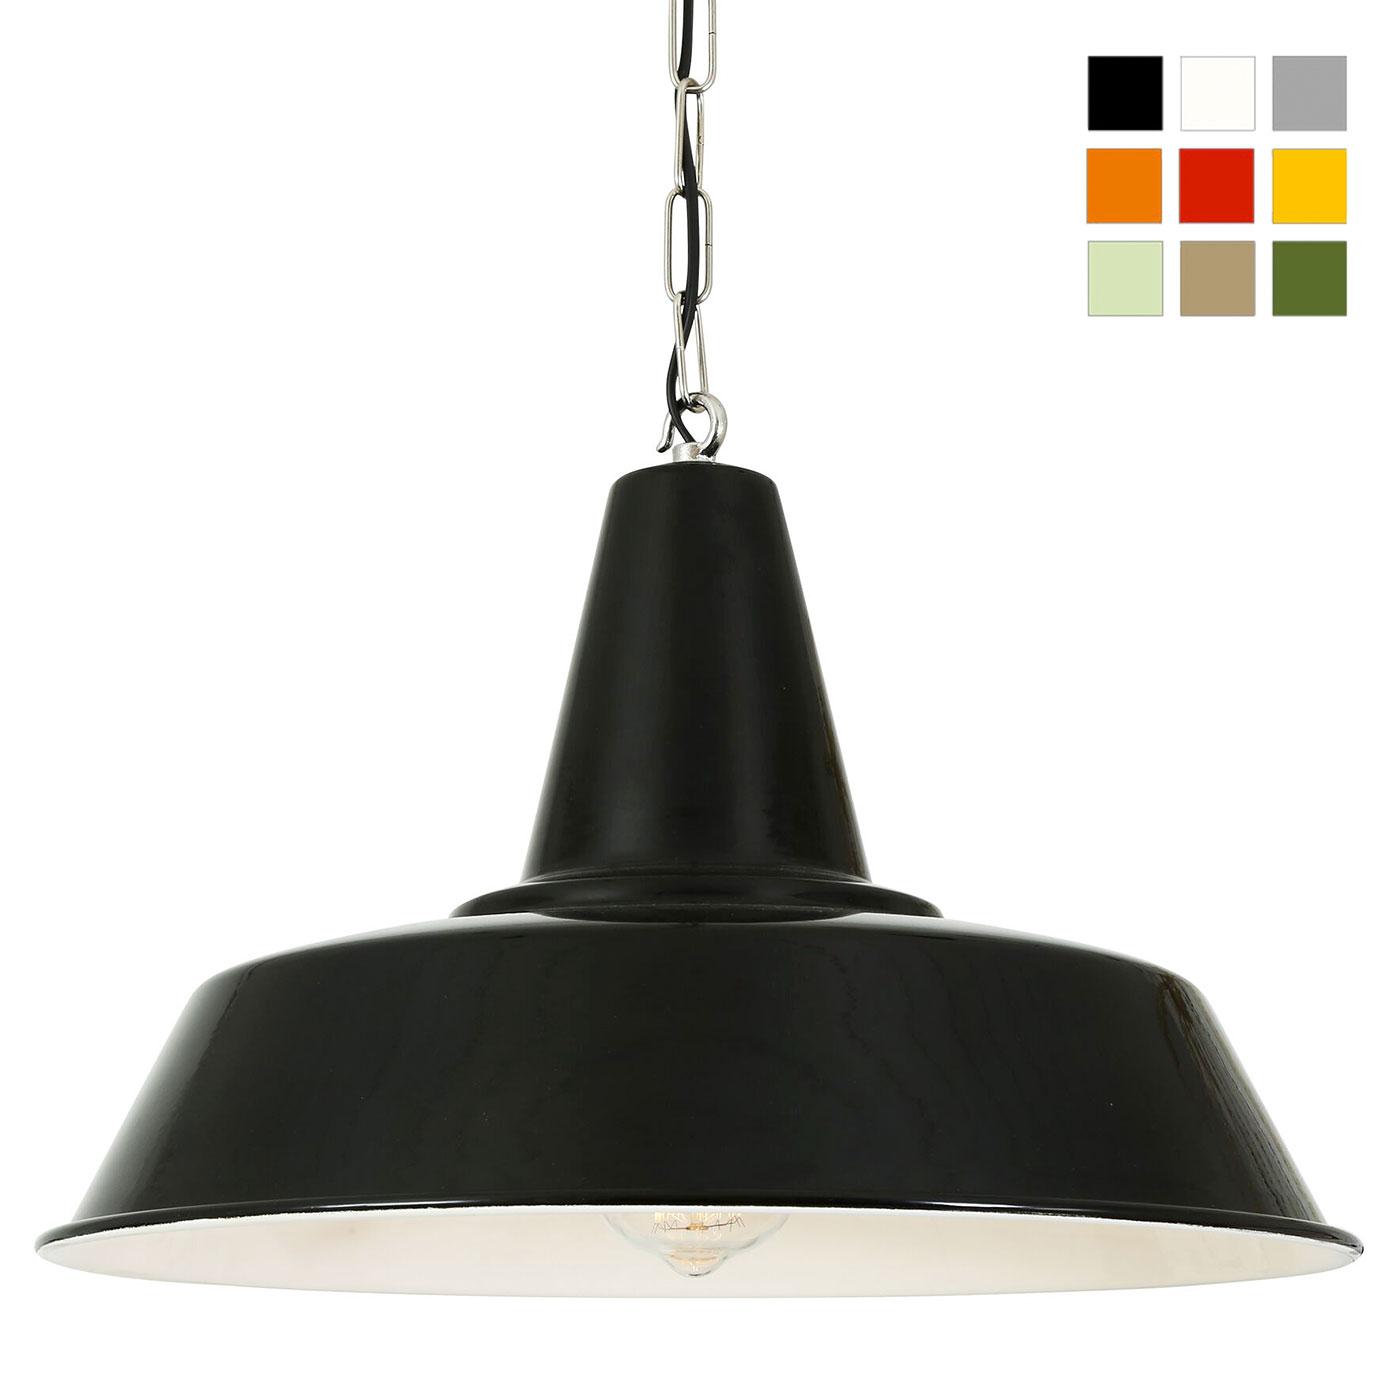 schwarze industriestil pendelleuchte 40 cm mit kette casa lumi. Black Bedroom Furniture Sets. Home Design Ideas